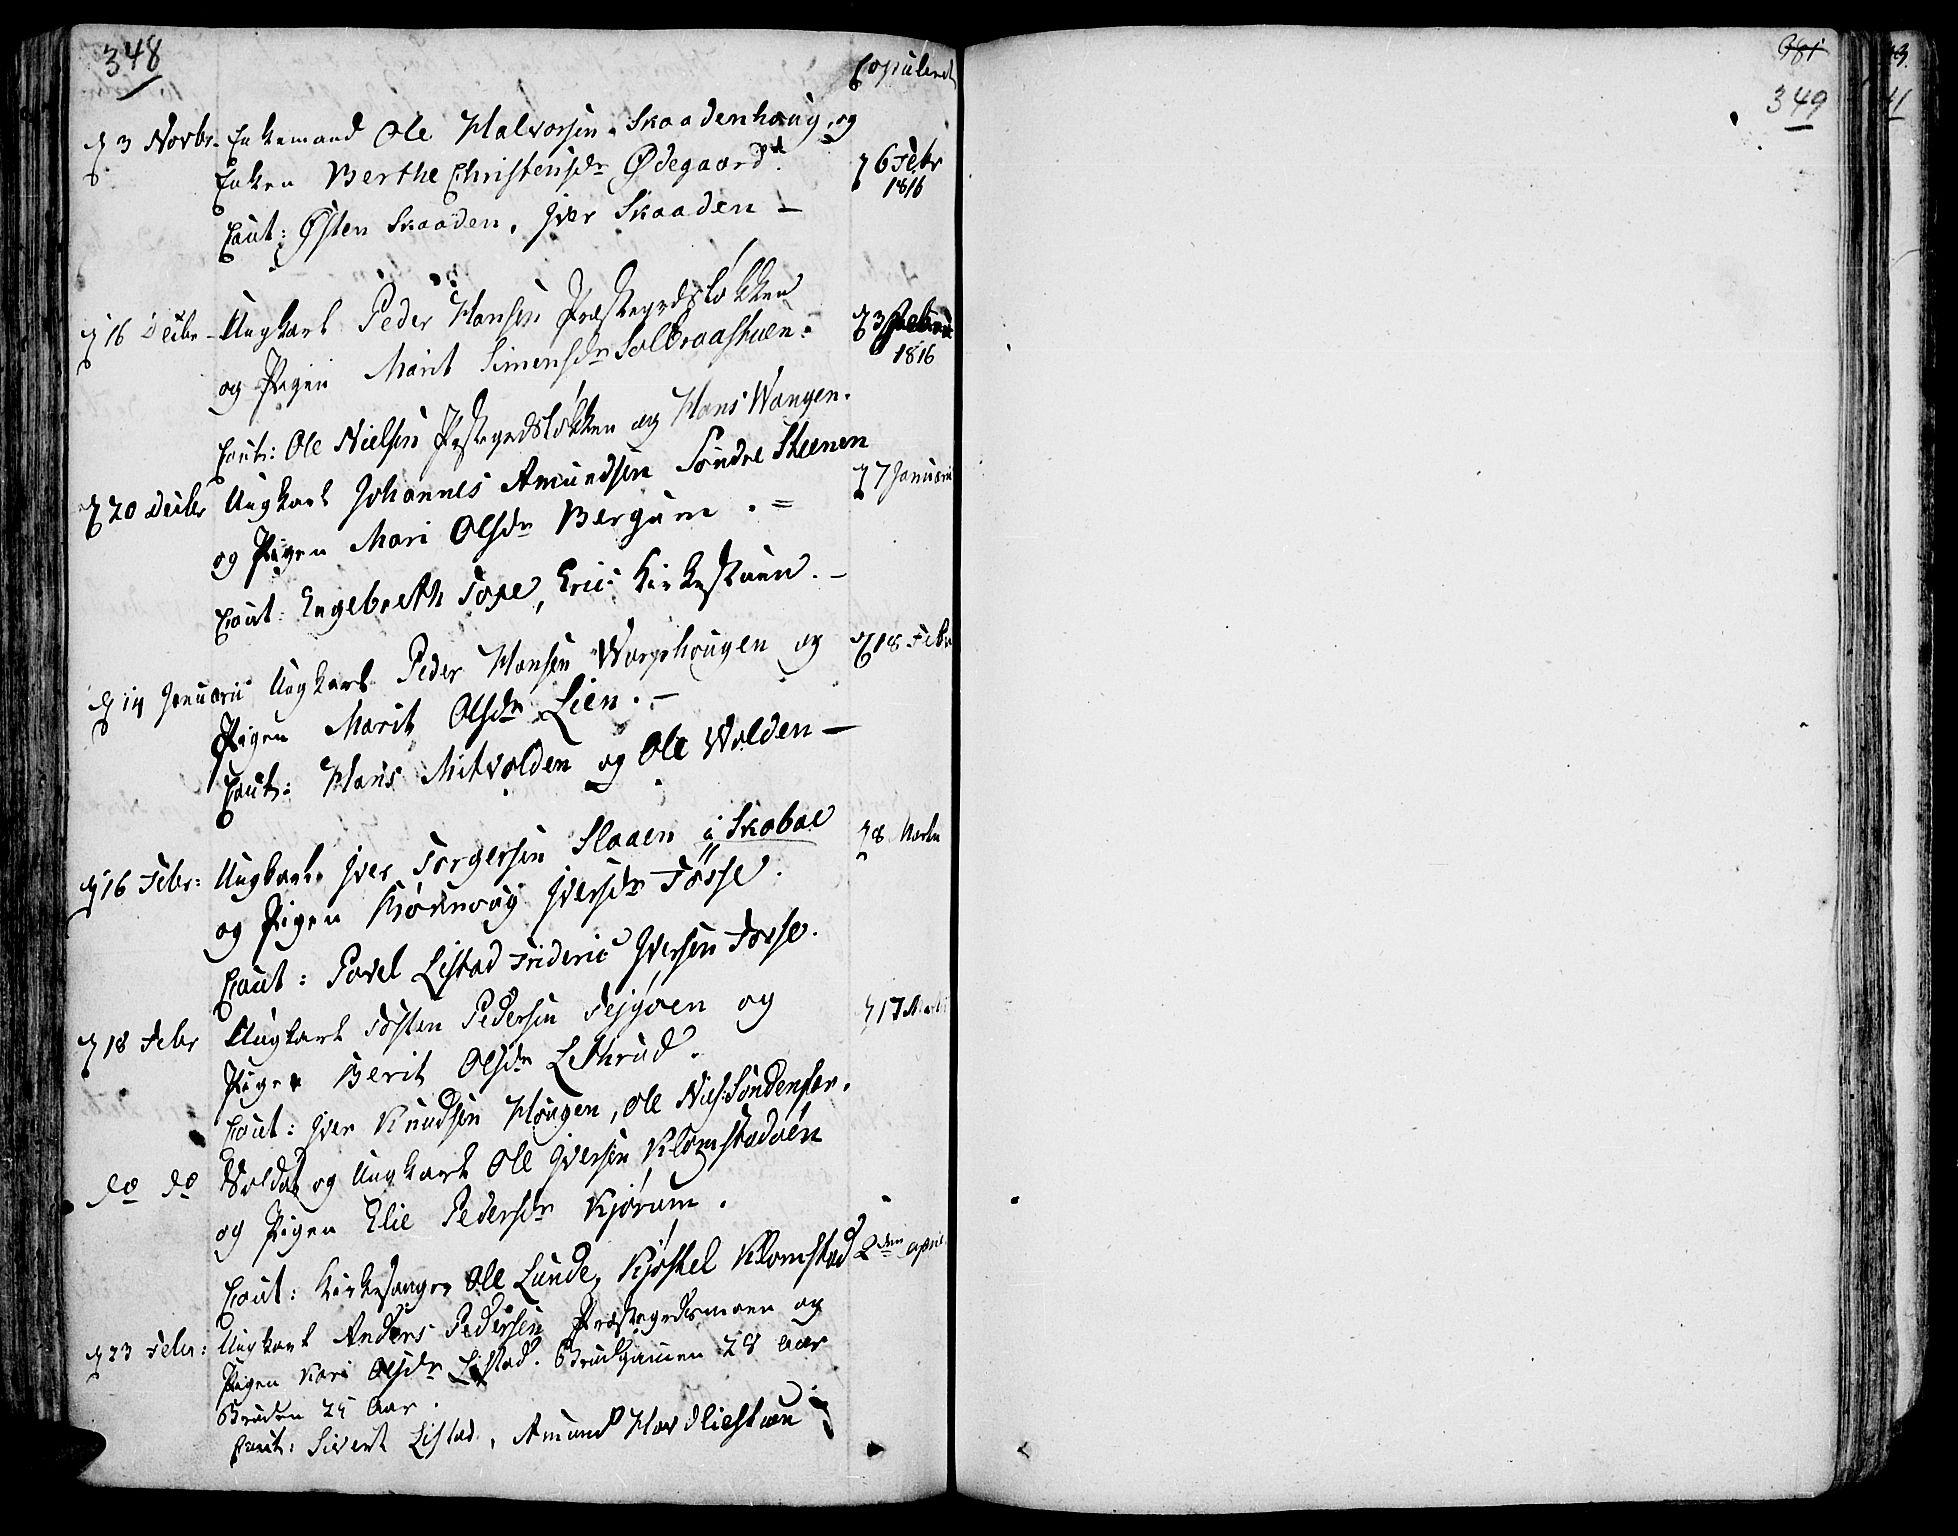 SAH, Fron prestekontor, H/Ha/Haa/L0001: Ministerialbok nr. 1, 1799-1816, s. 348-349